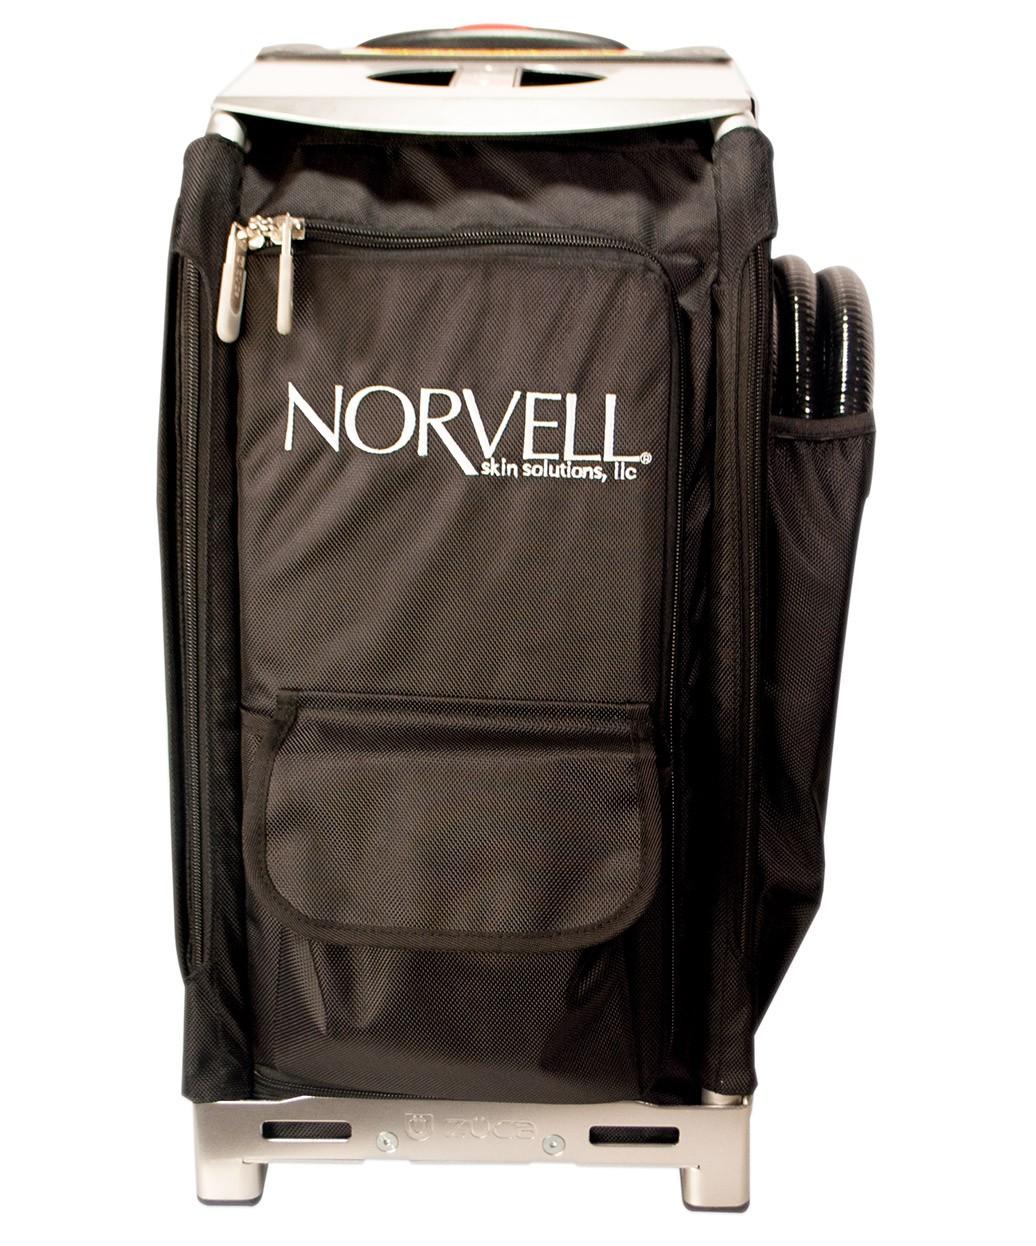 Norvell Sunless Pro Travel Kit